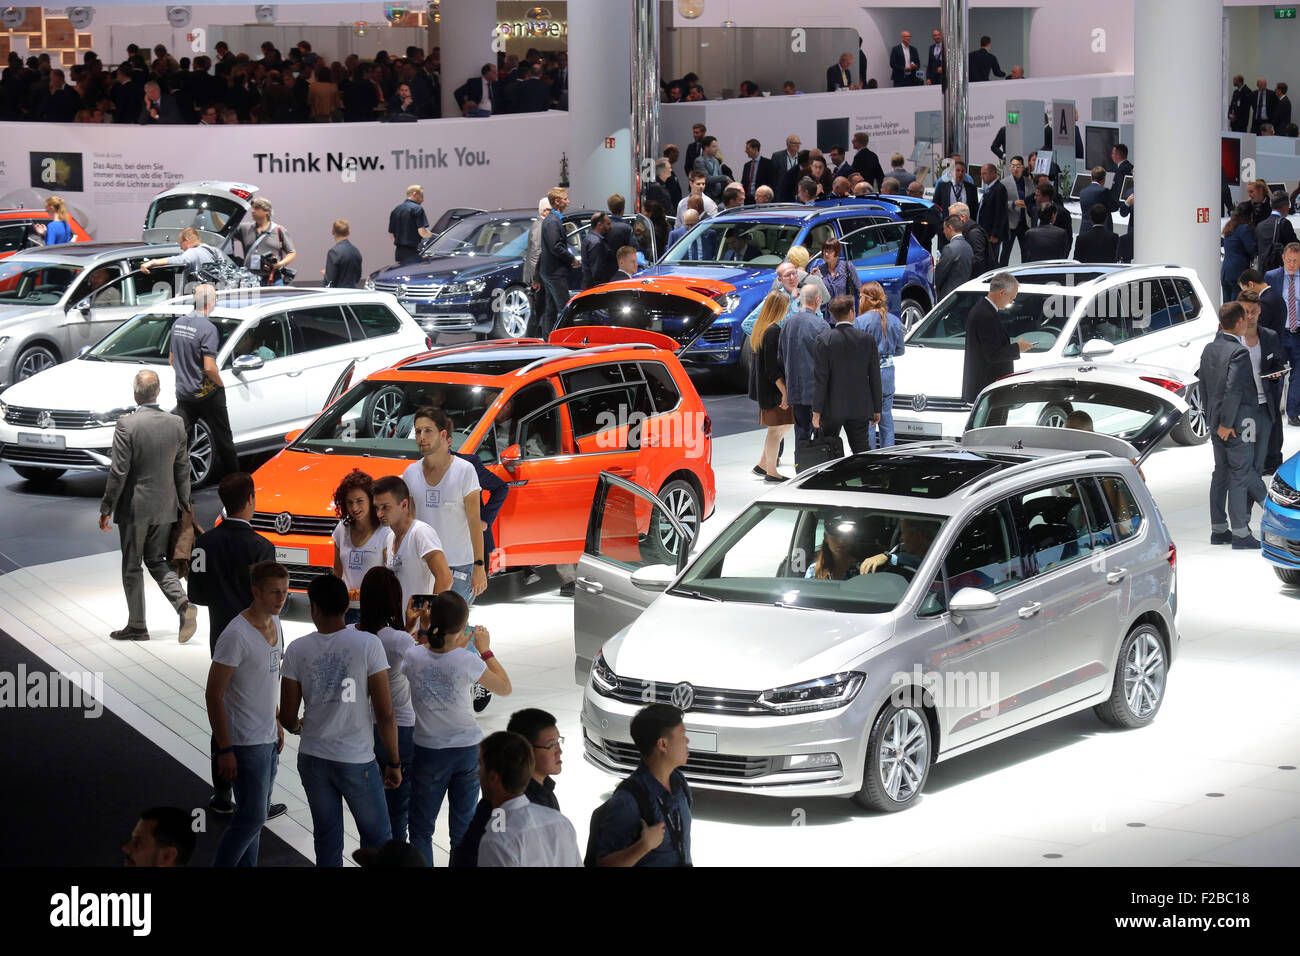 New VW Volkswagen cars at the 66th International Motor Show IAA 2015 (Internationale Automobil Ausstellung, IAA) - Stock Image